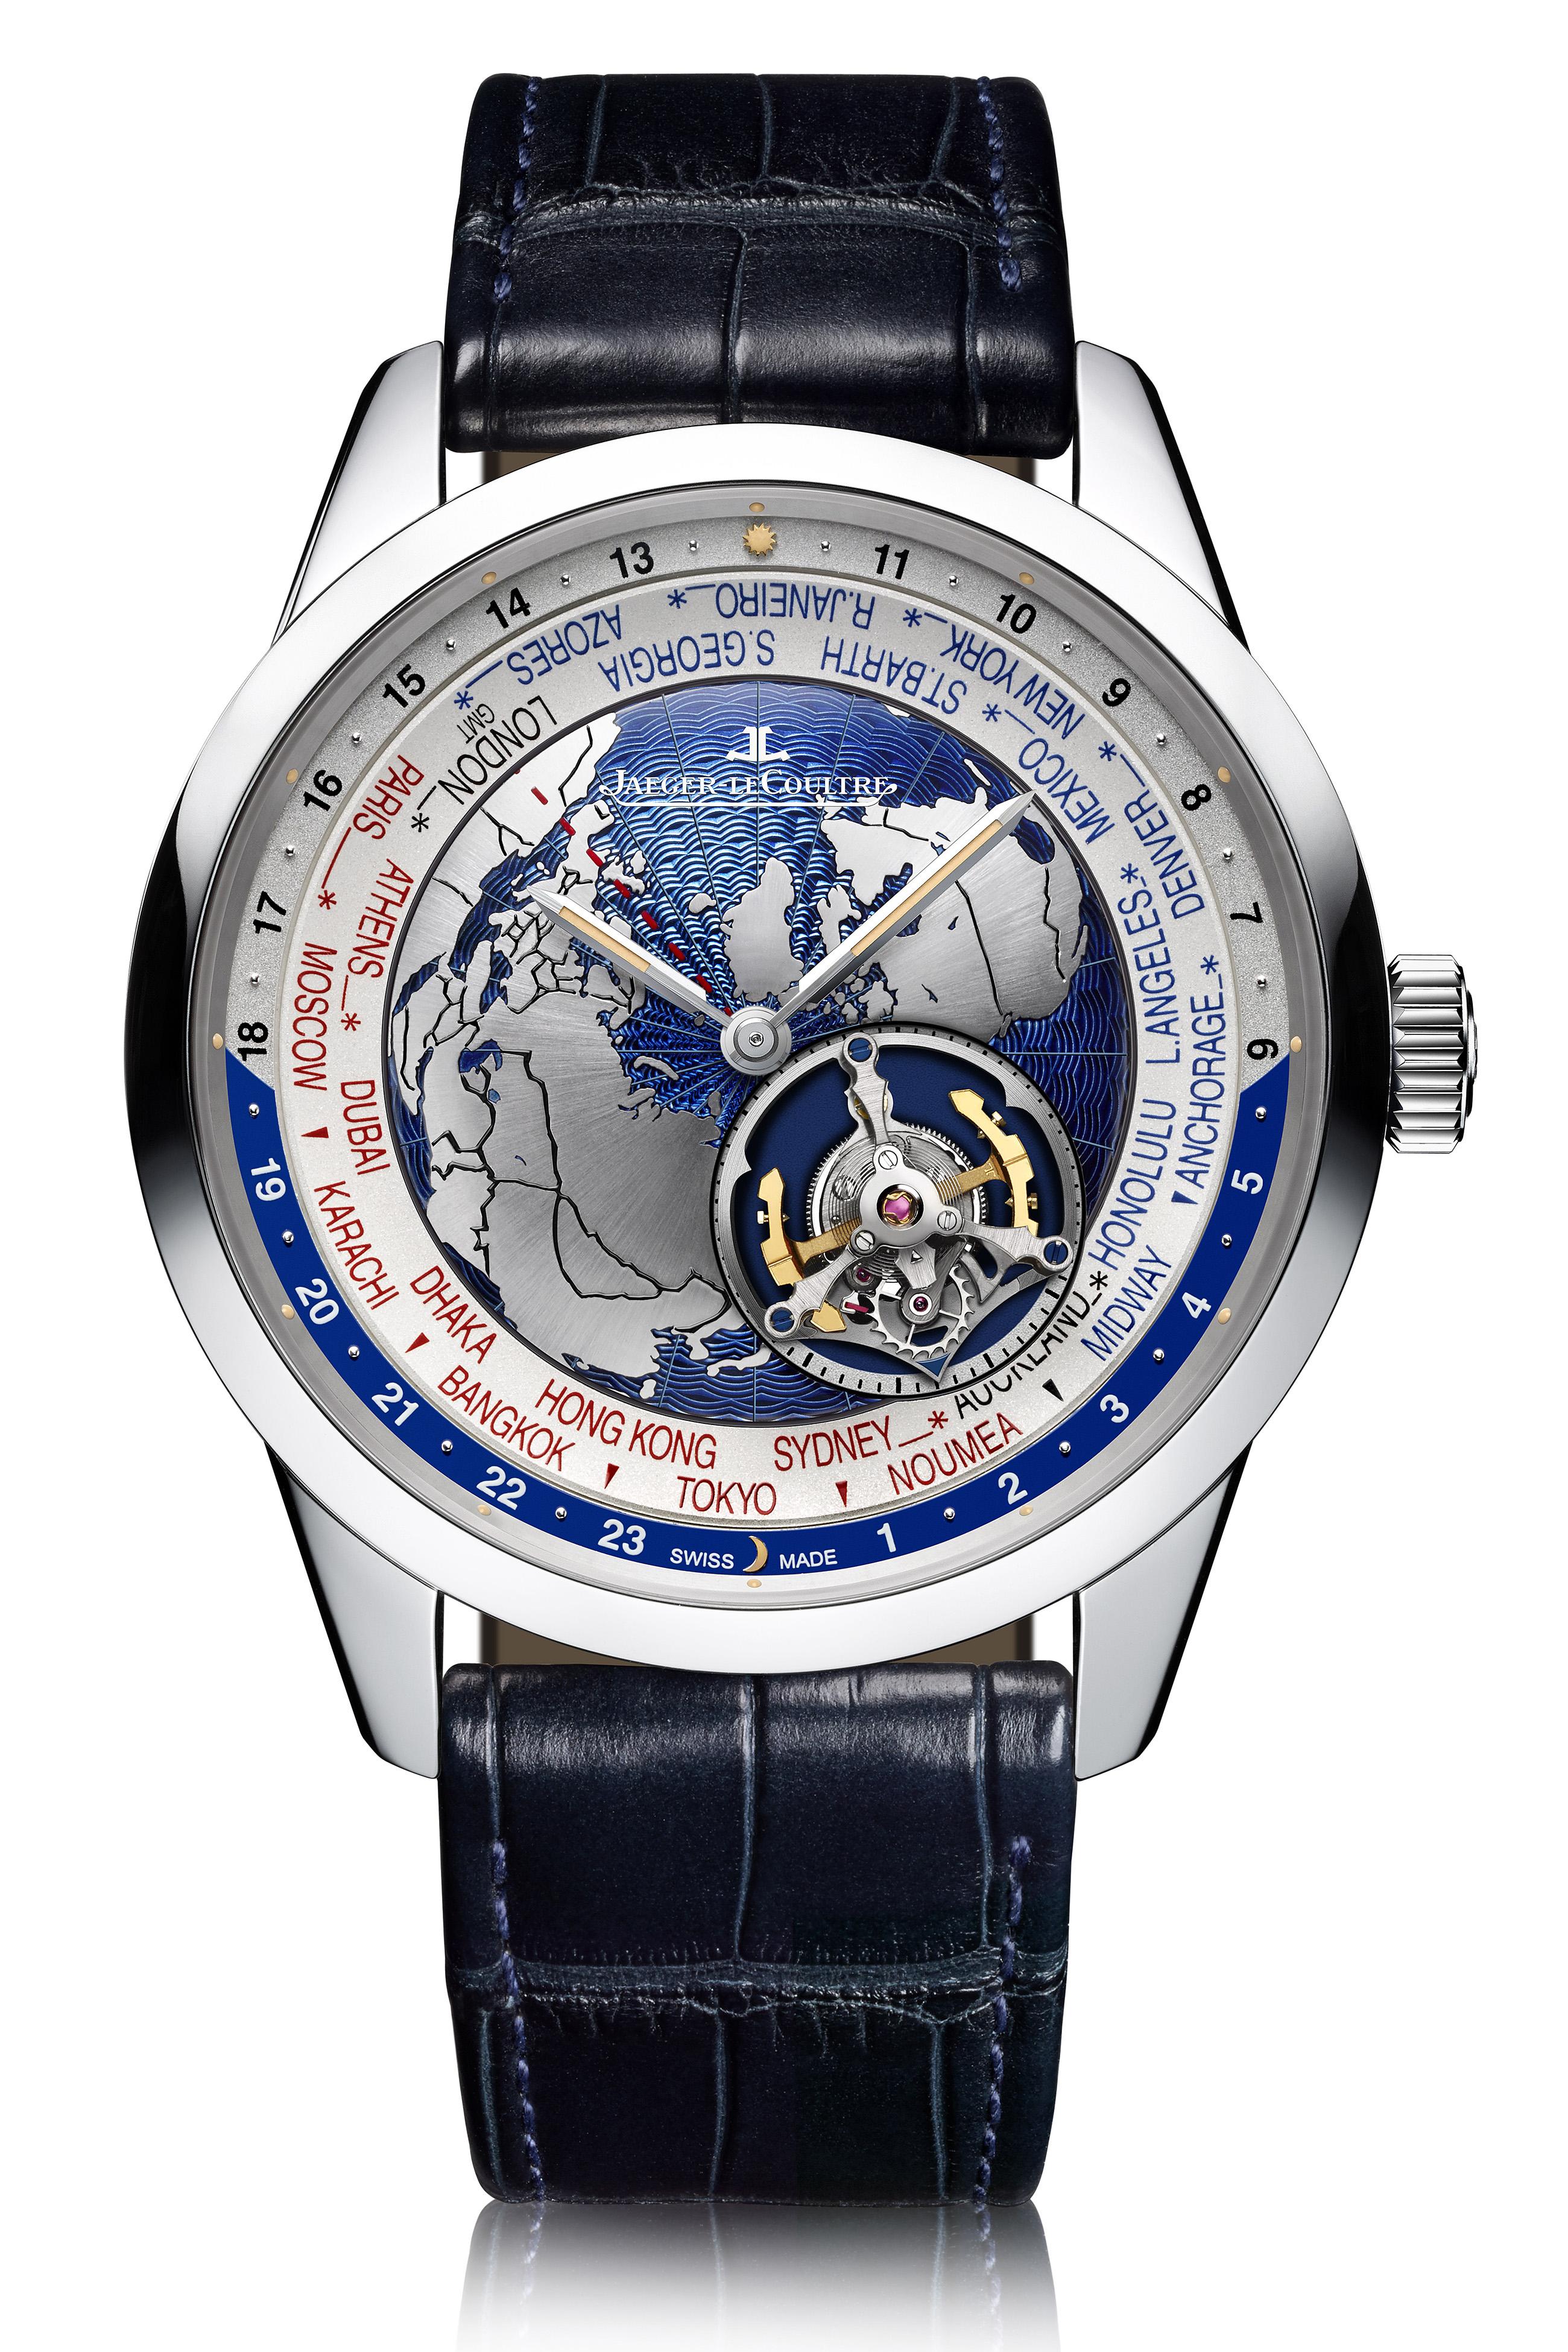 Jaeger-LeCoultre Geophysic Tourbillon Universal Time copy.jpg